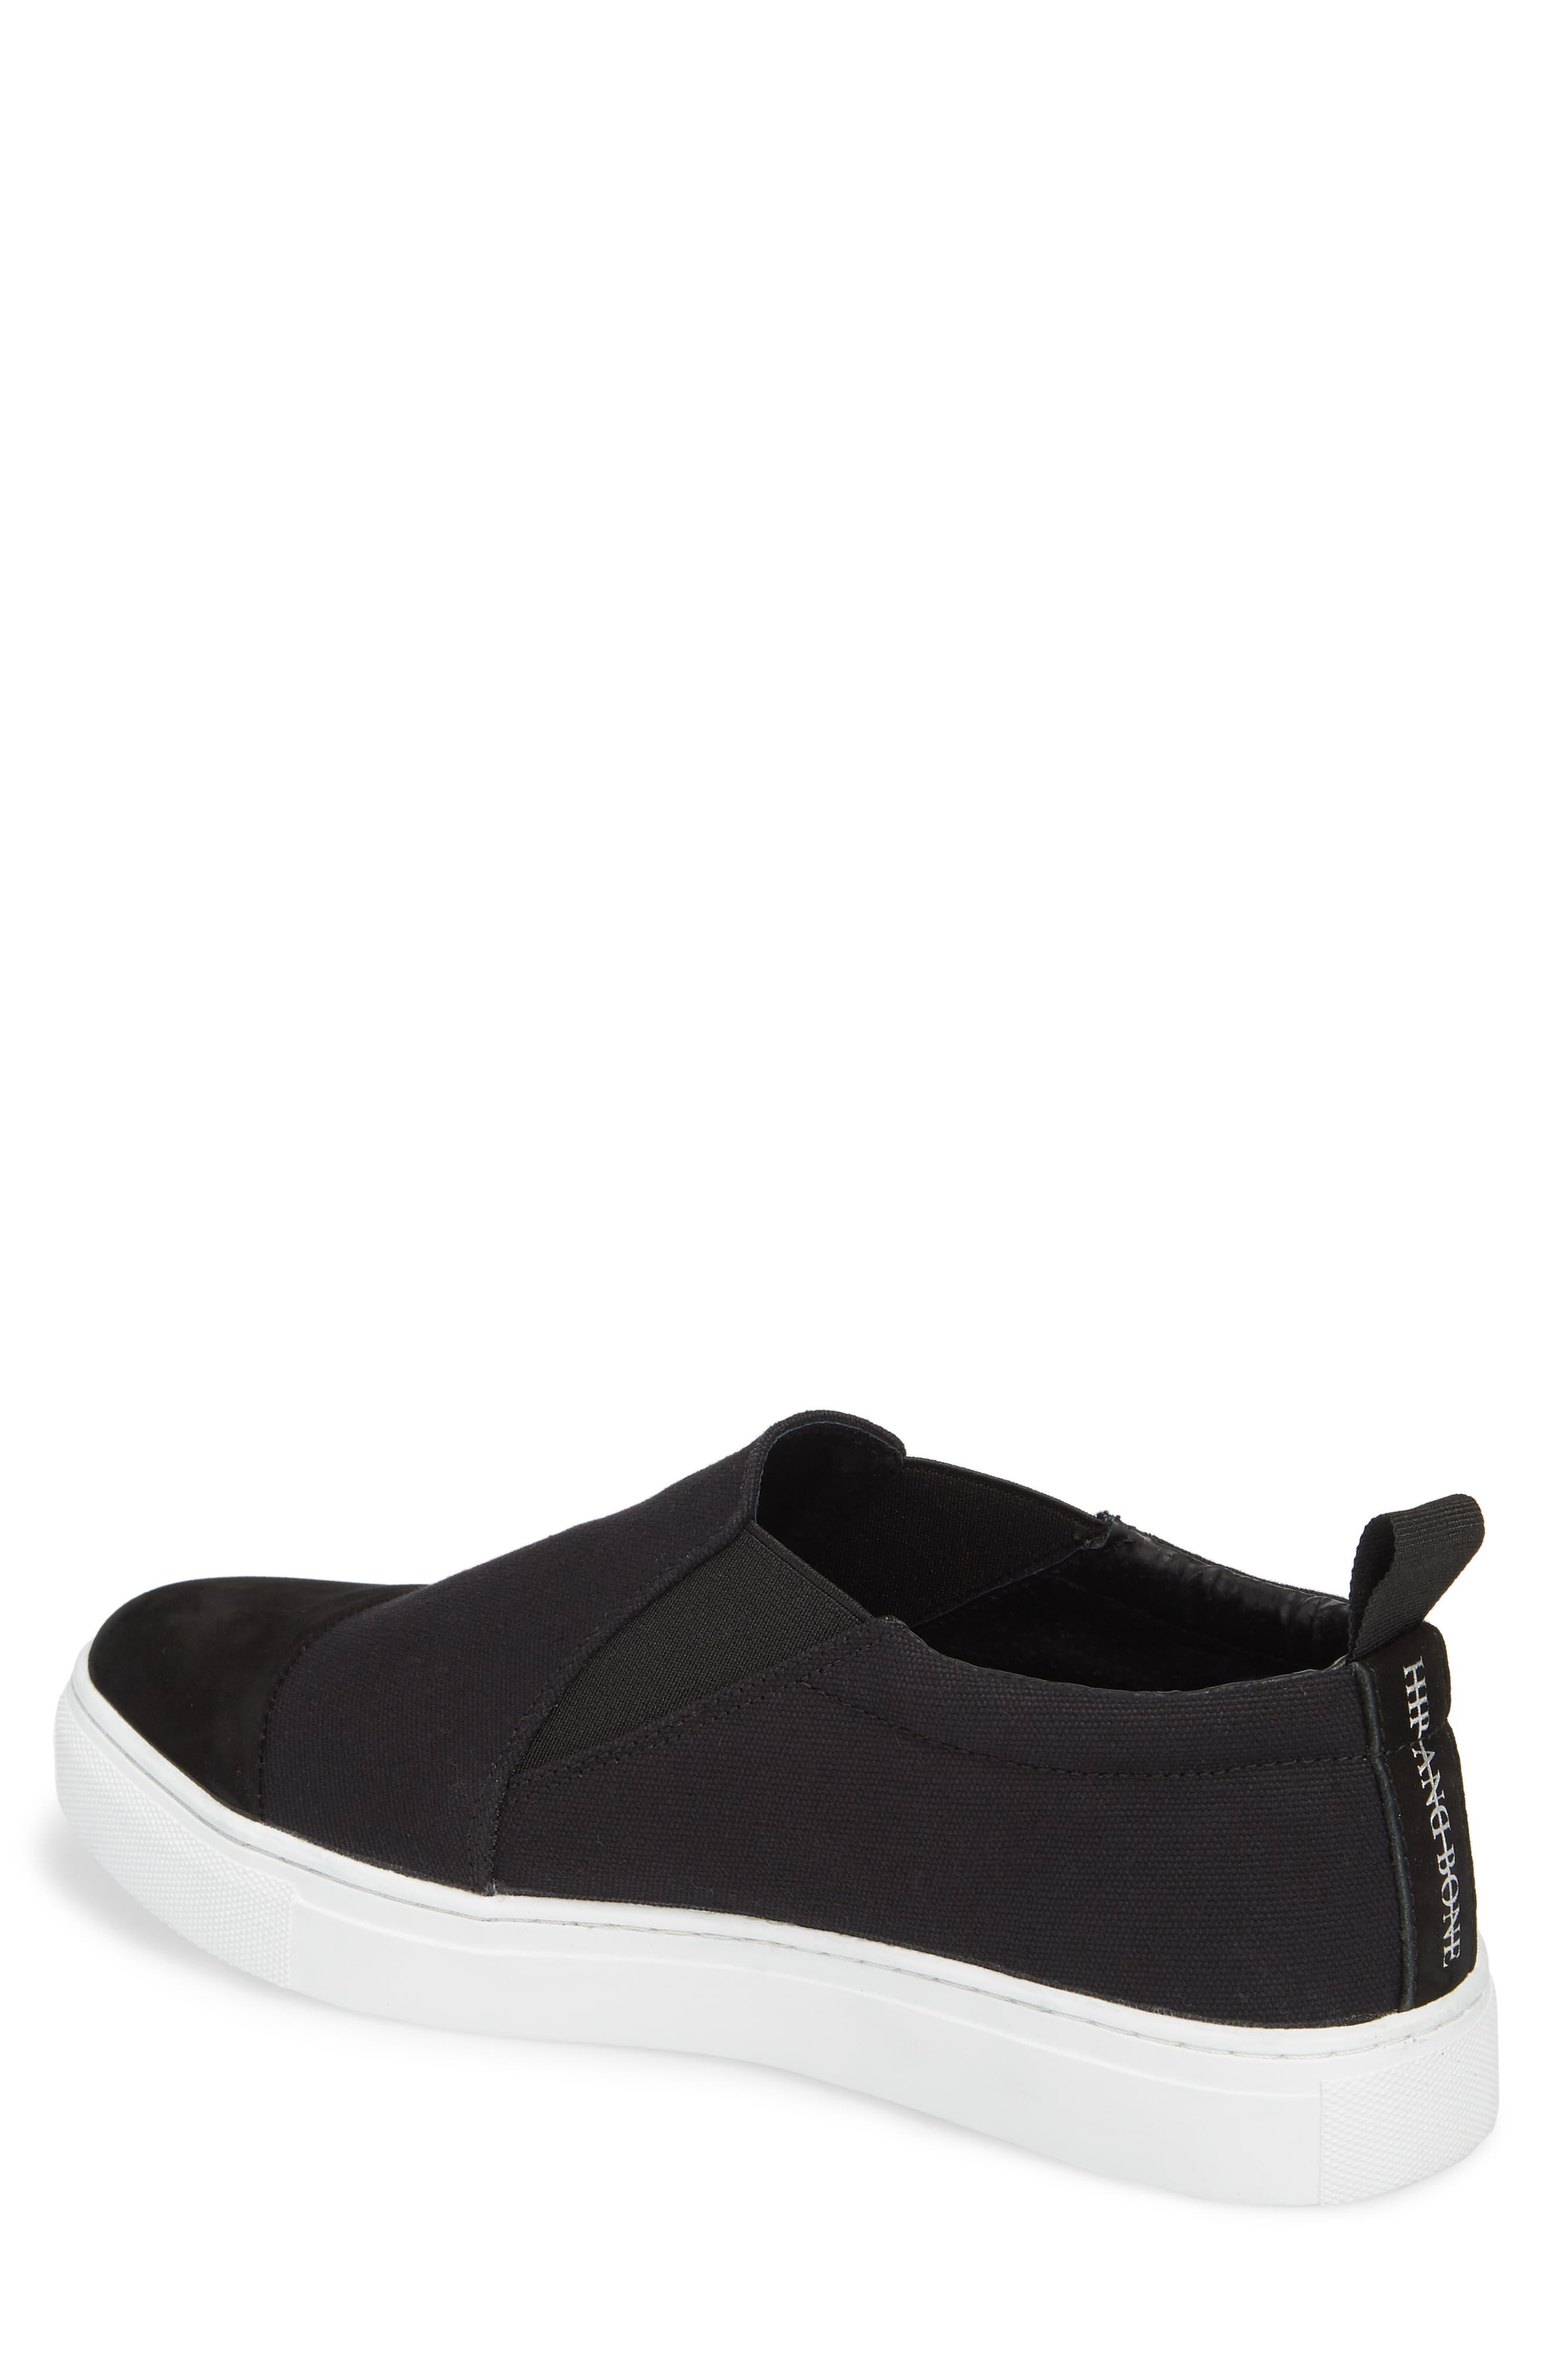 Canvas Suede Slider Slip-On Sneaker,                             Alternate thumbnail 2, color,                             001